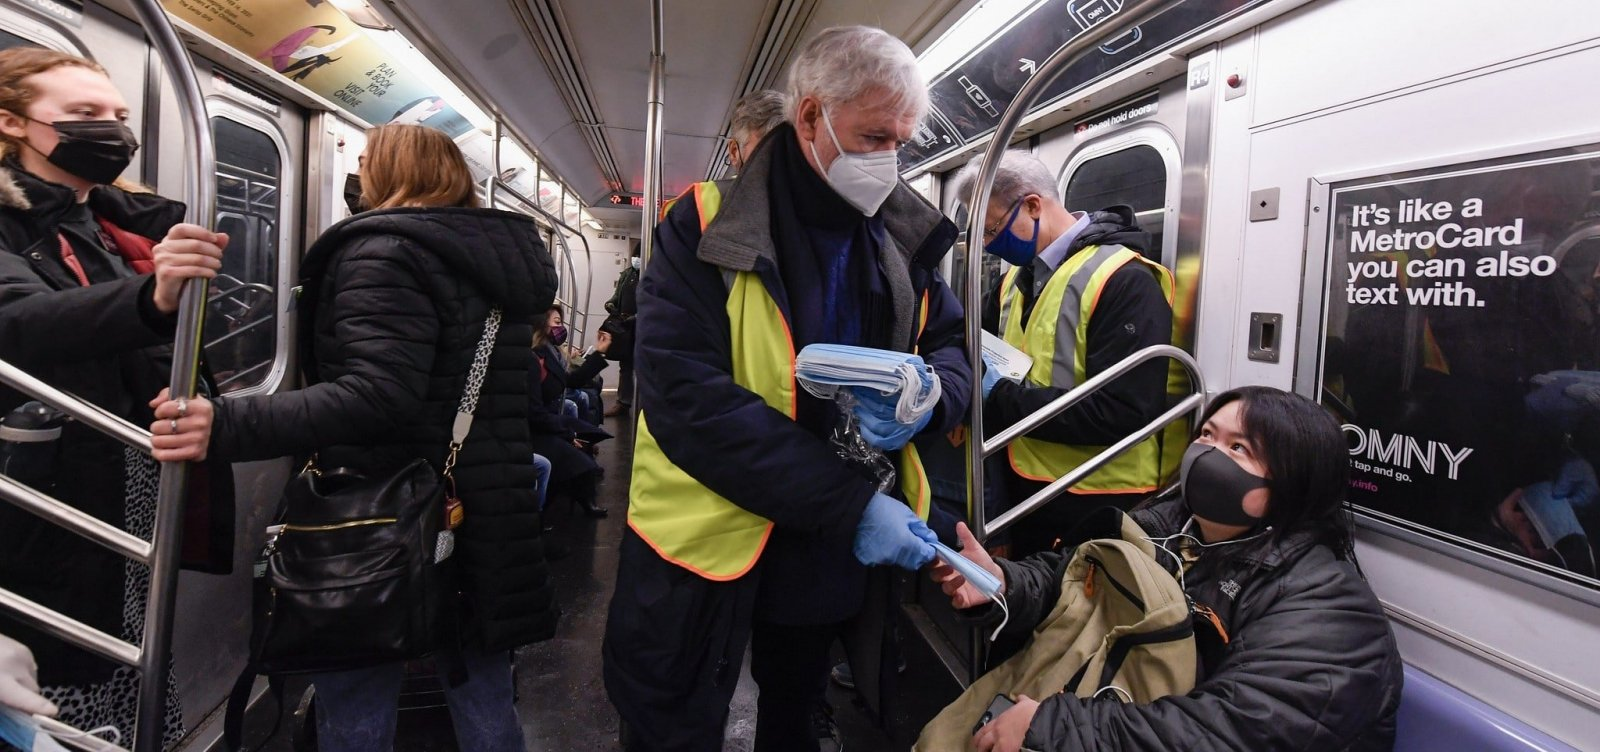 Uso de duas máscaras pode aumentar eficácia contra coronavírus, aponta estudo